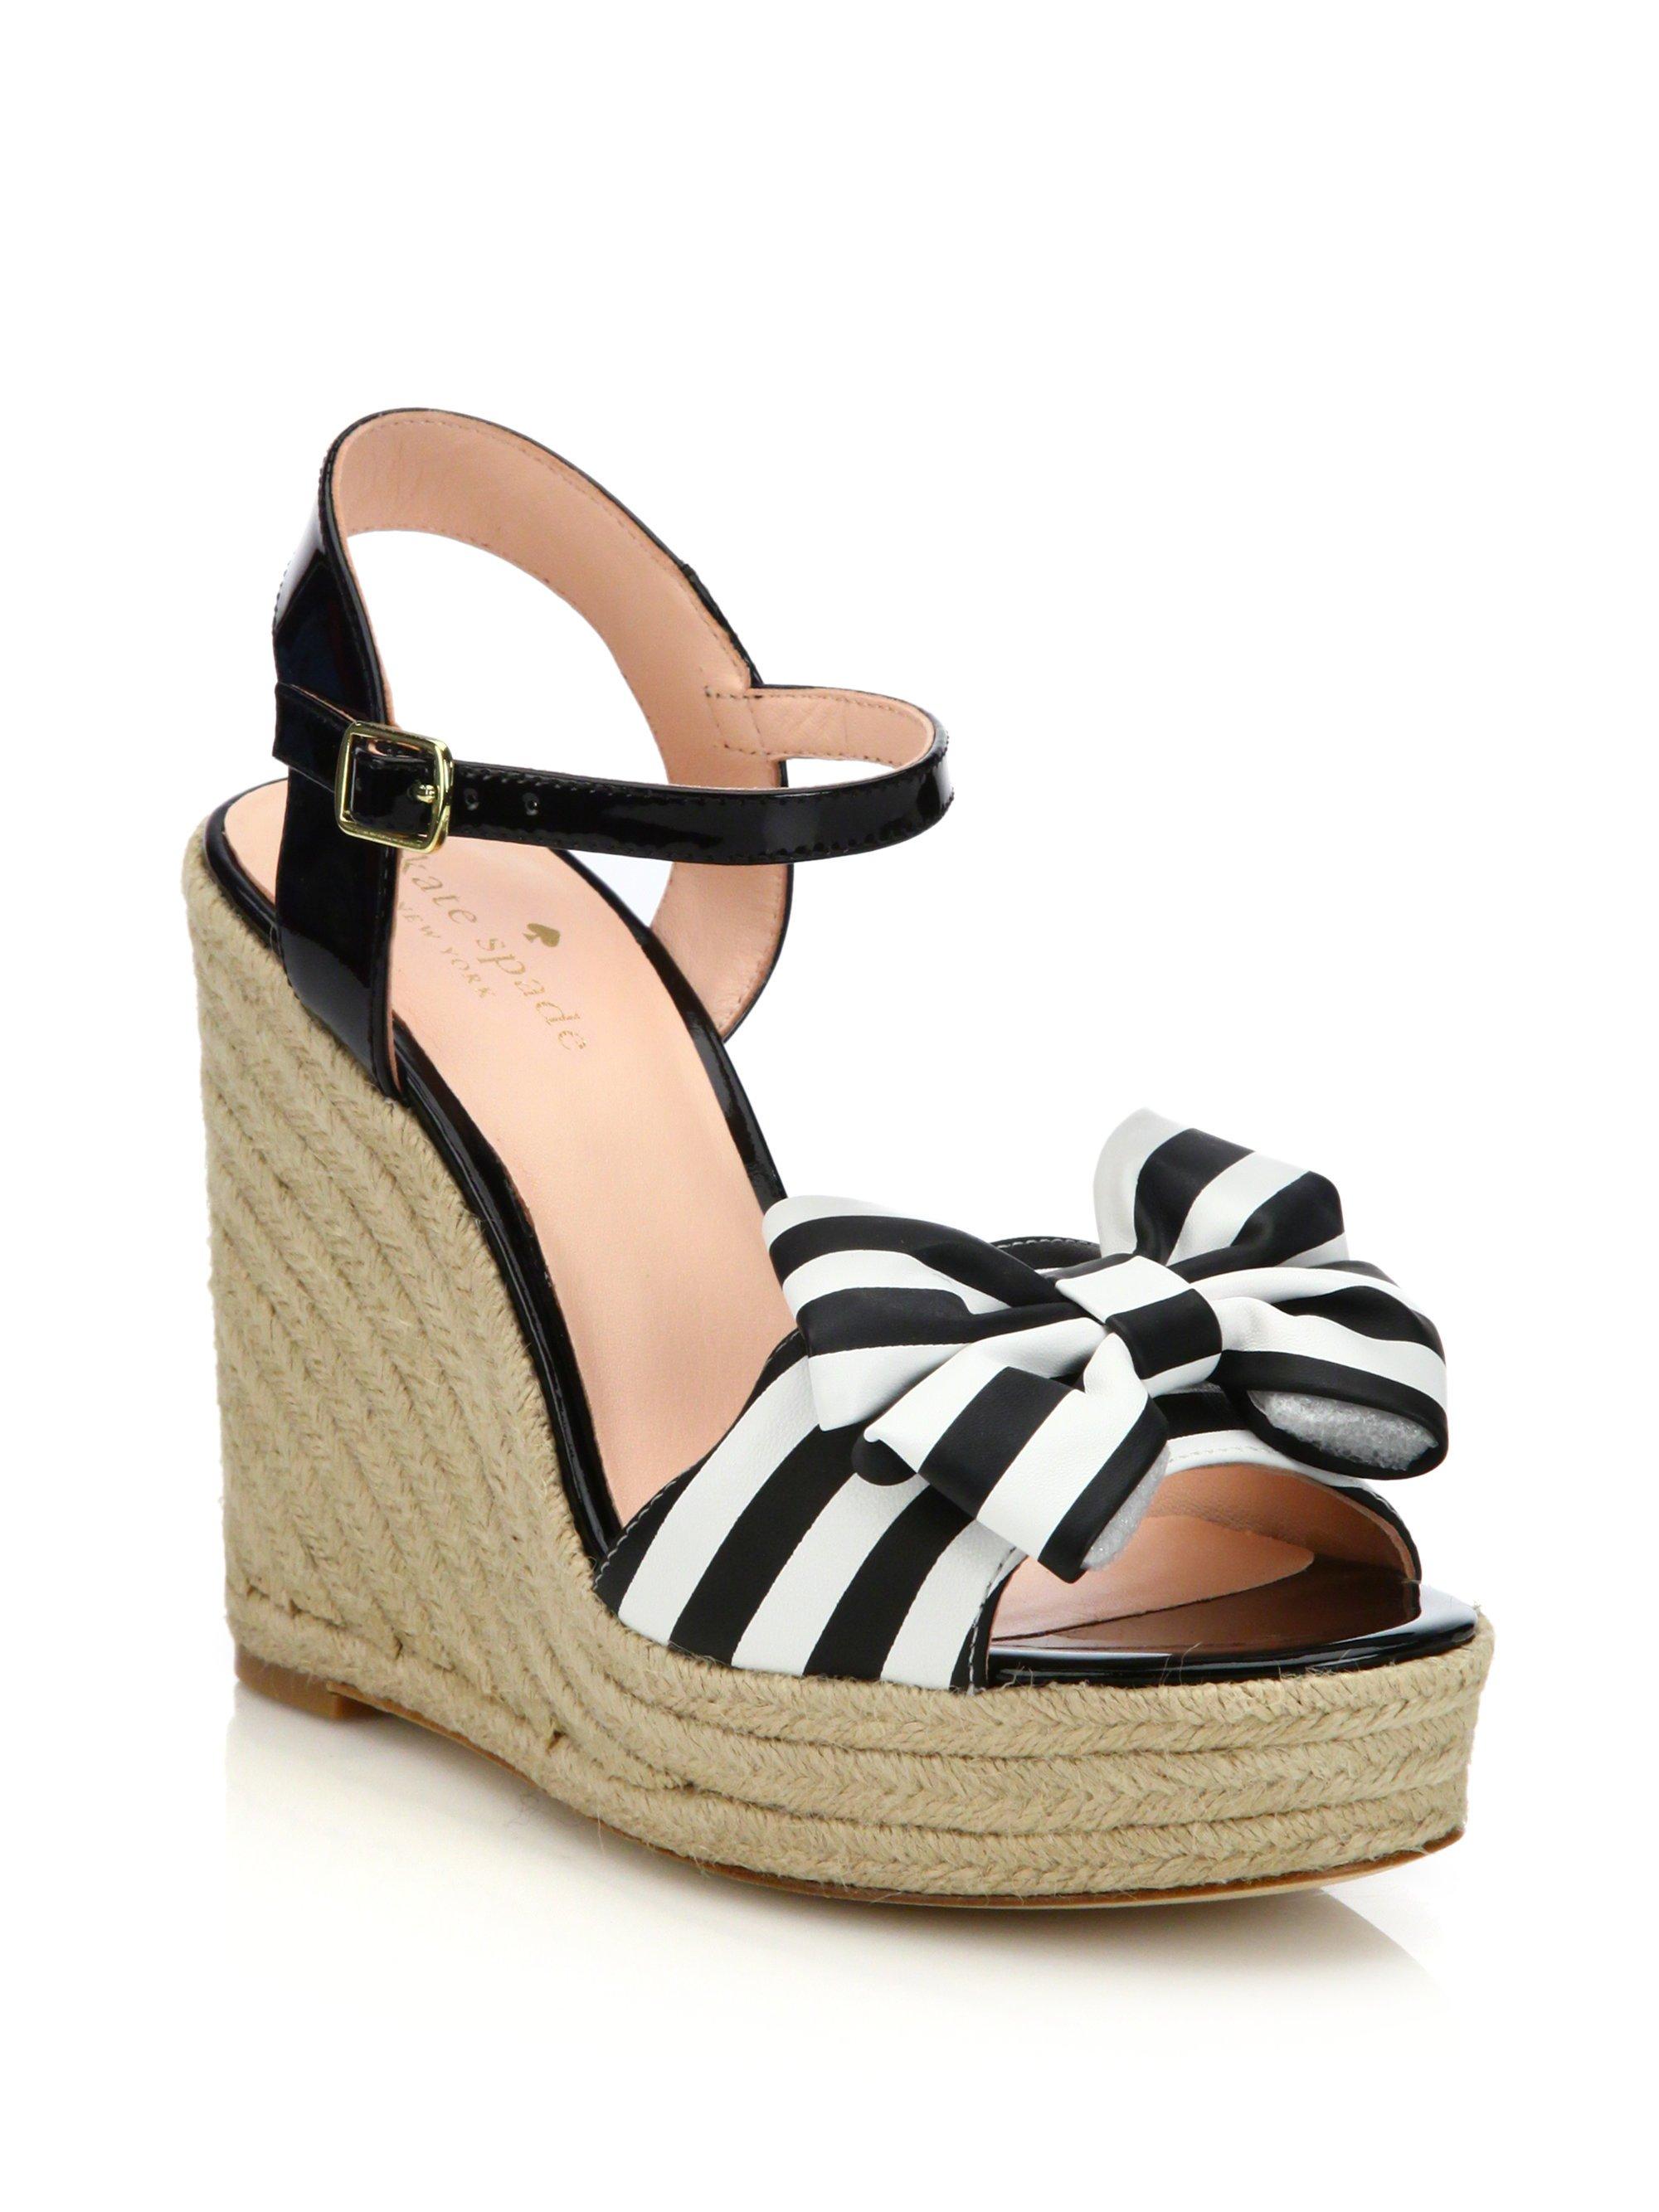 wedges sandals 28 images 2016 new high heels sandals